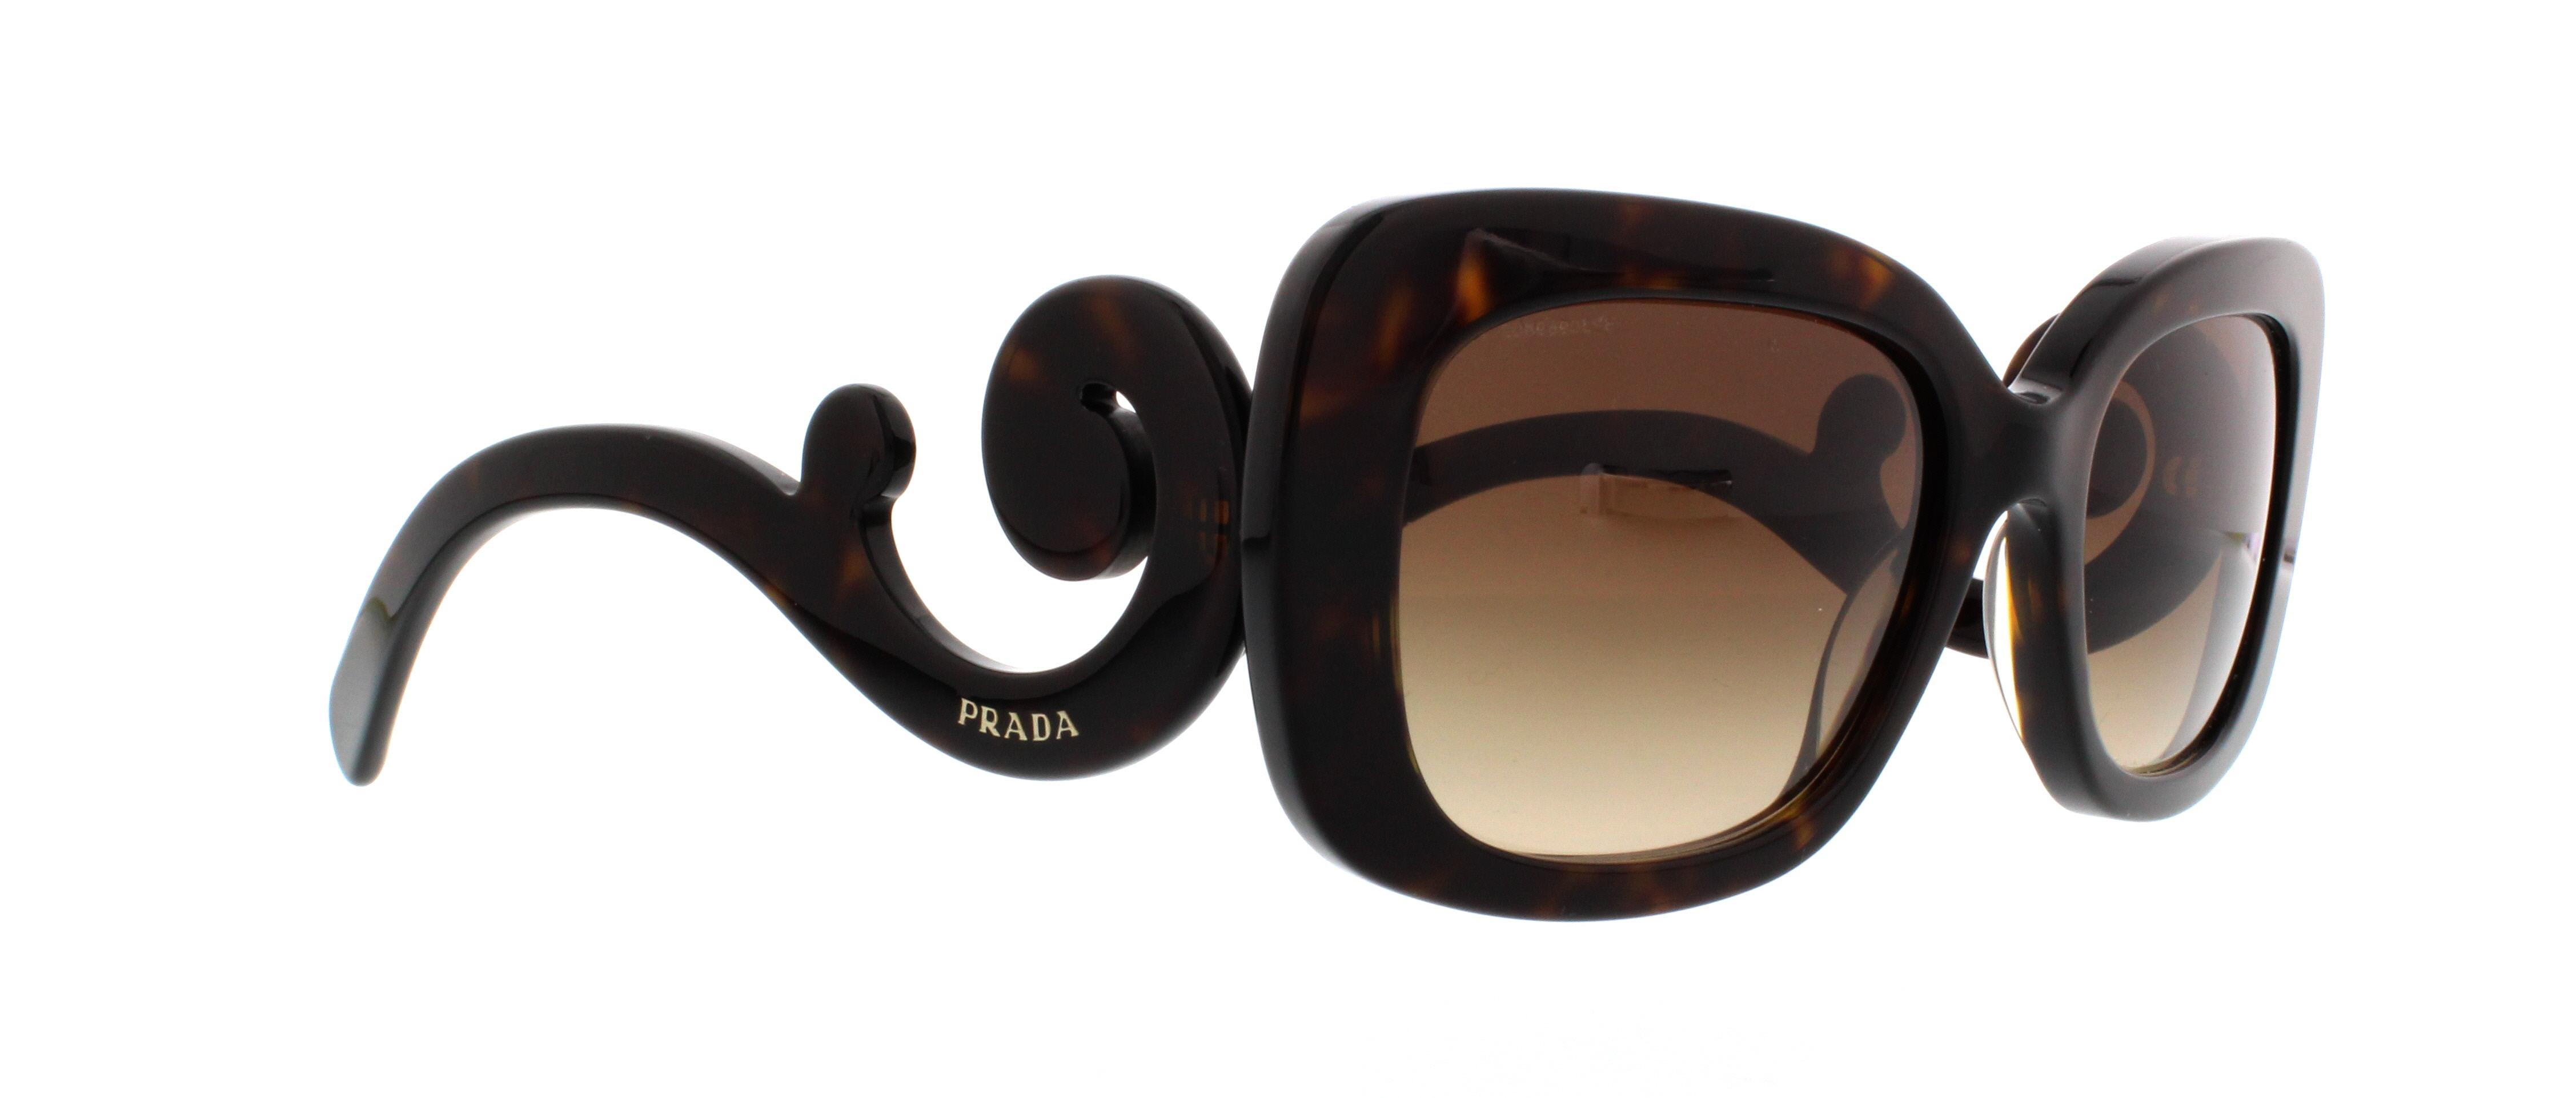 e8ebedca8 ... pr 27os minimal baroque sunglasses 4903304891my b15c6 e8480 hot prada  sunglasses pr27os minimal baroque 2au6s1 havana 54mm d7427 152ab ...